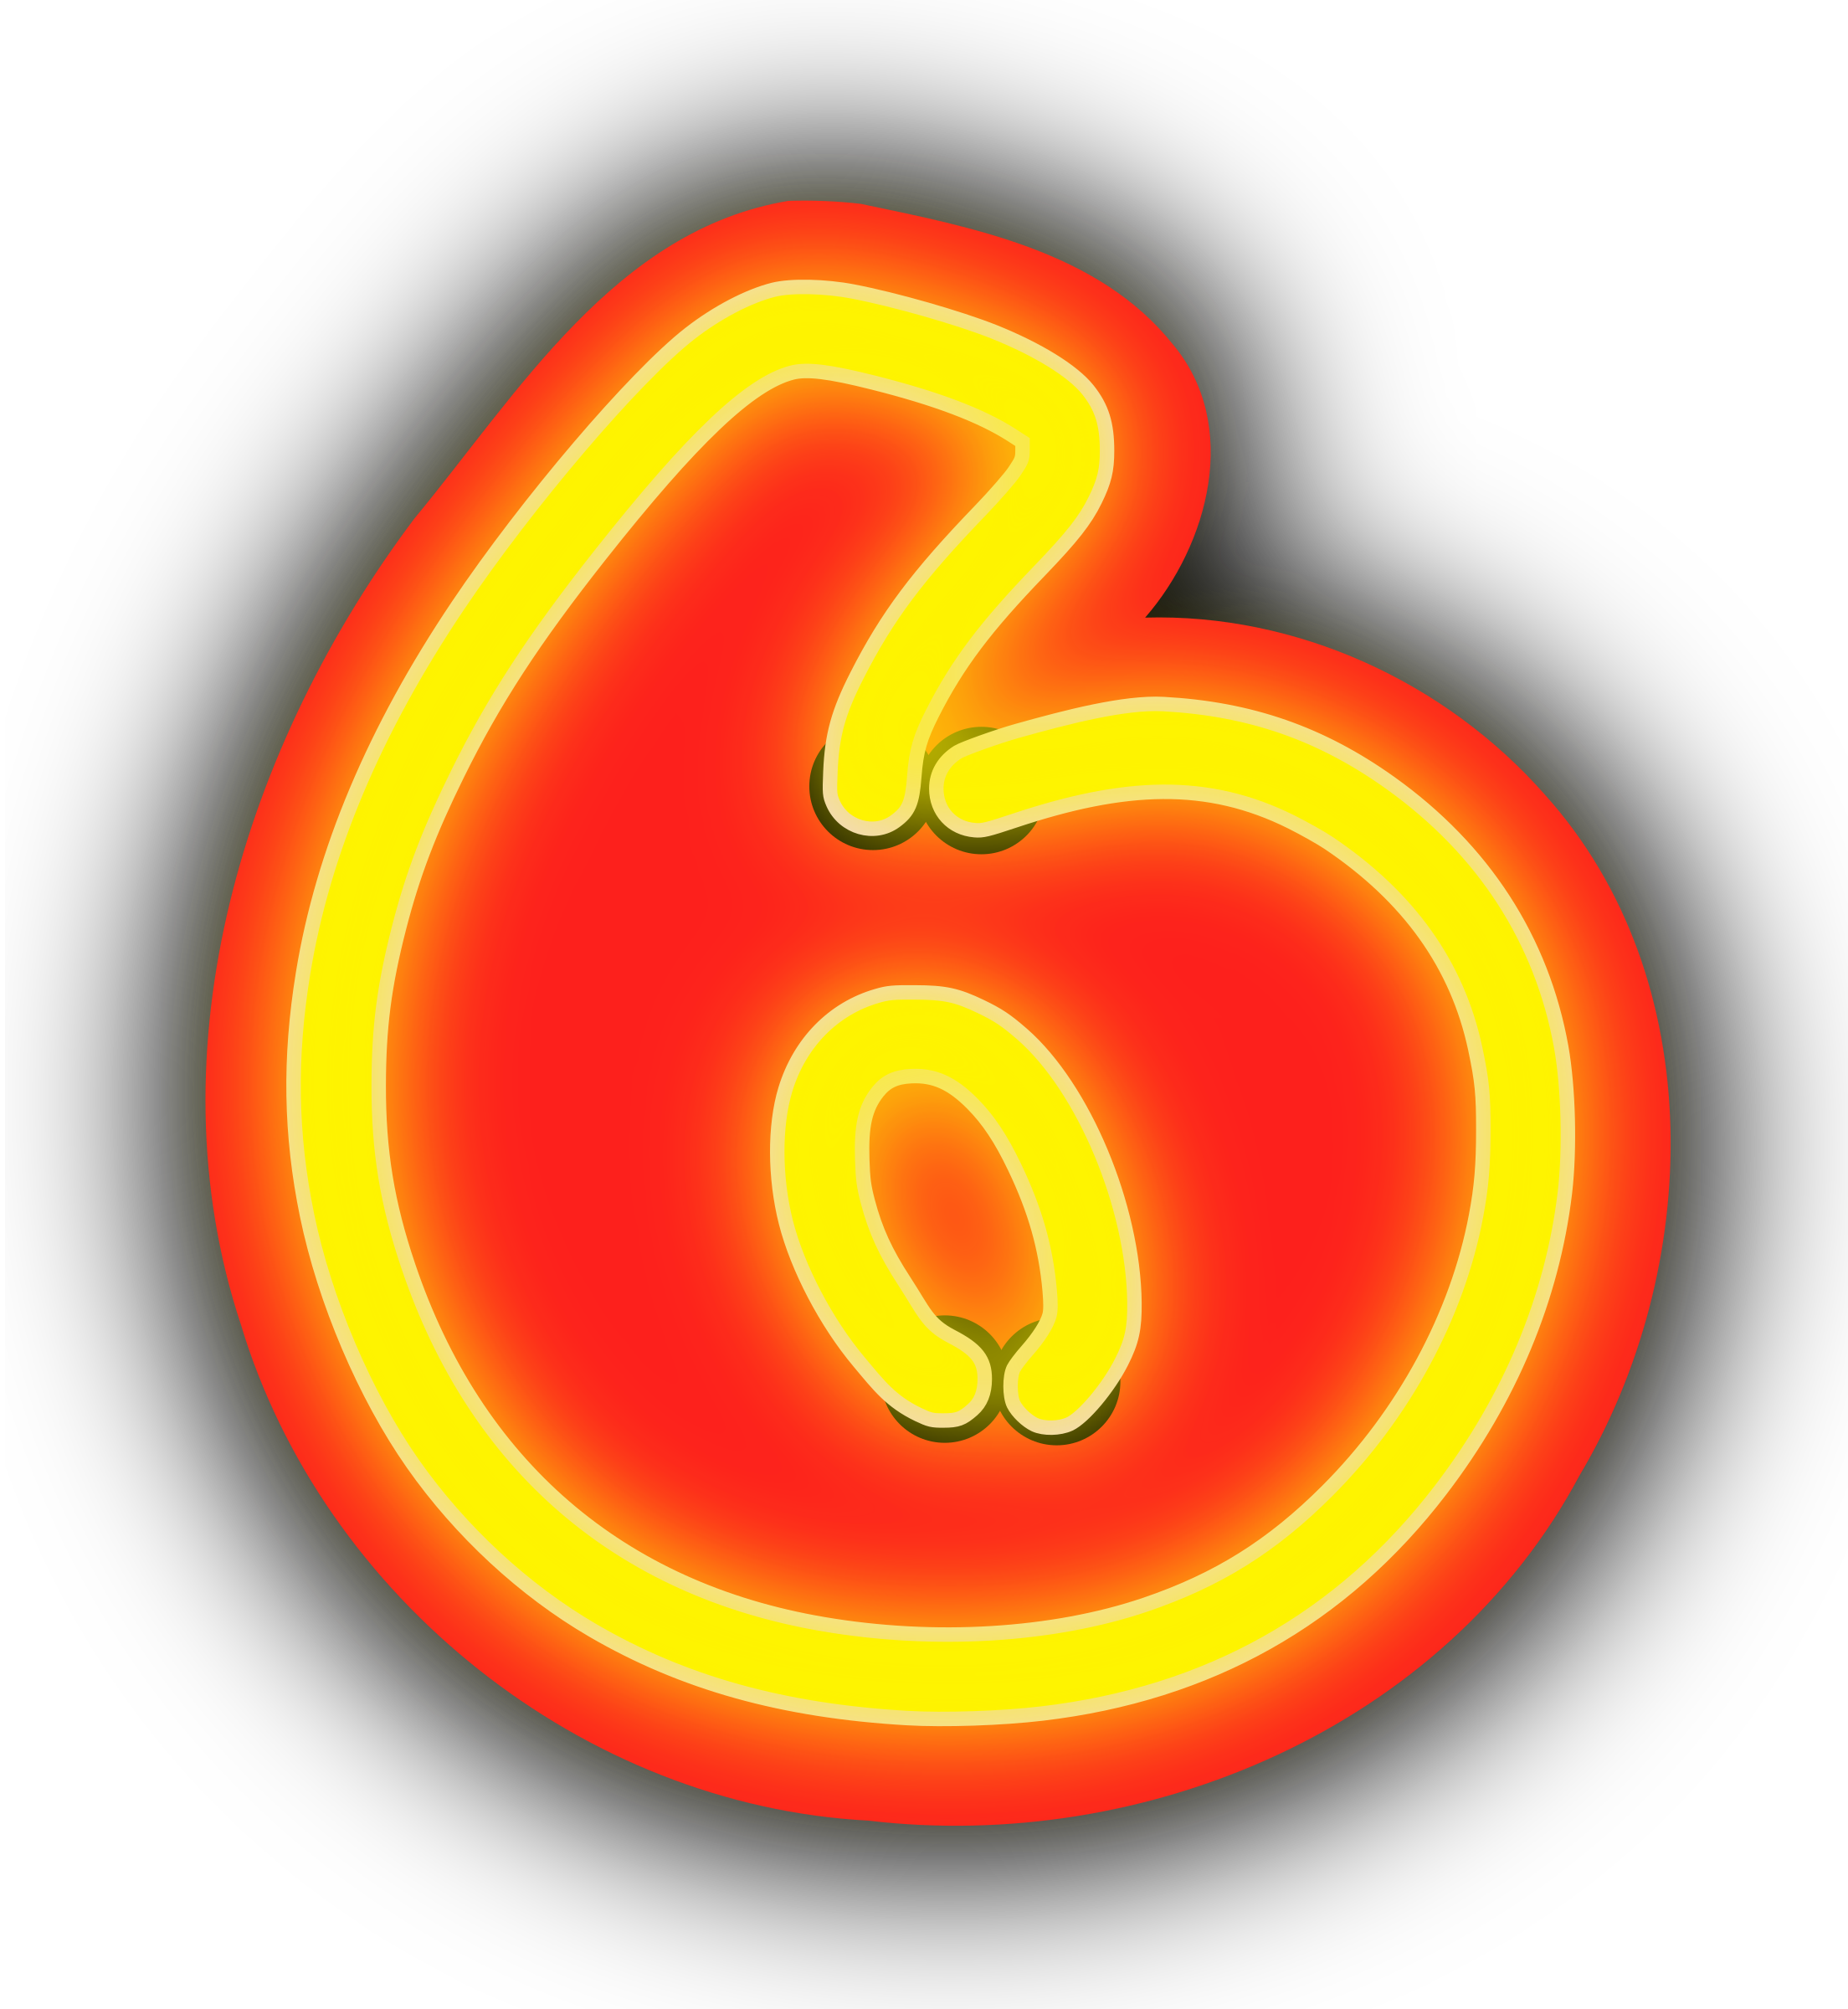 Clipart 6. Neon numerals big image